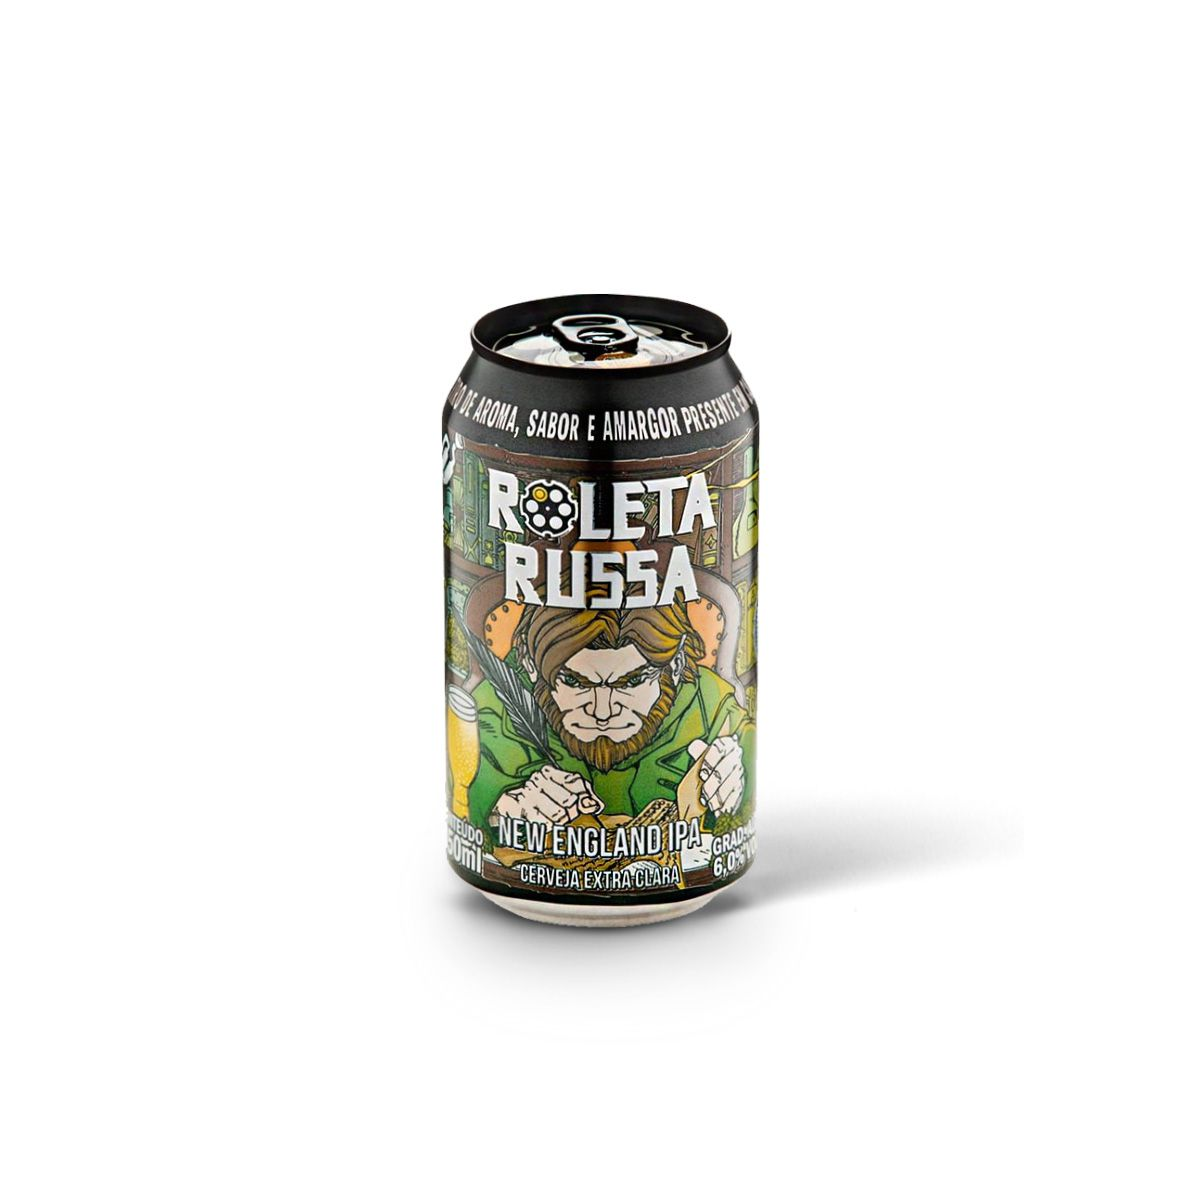 Roleta Russa New England IPA 350ml